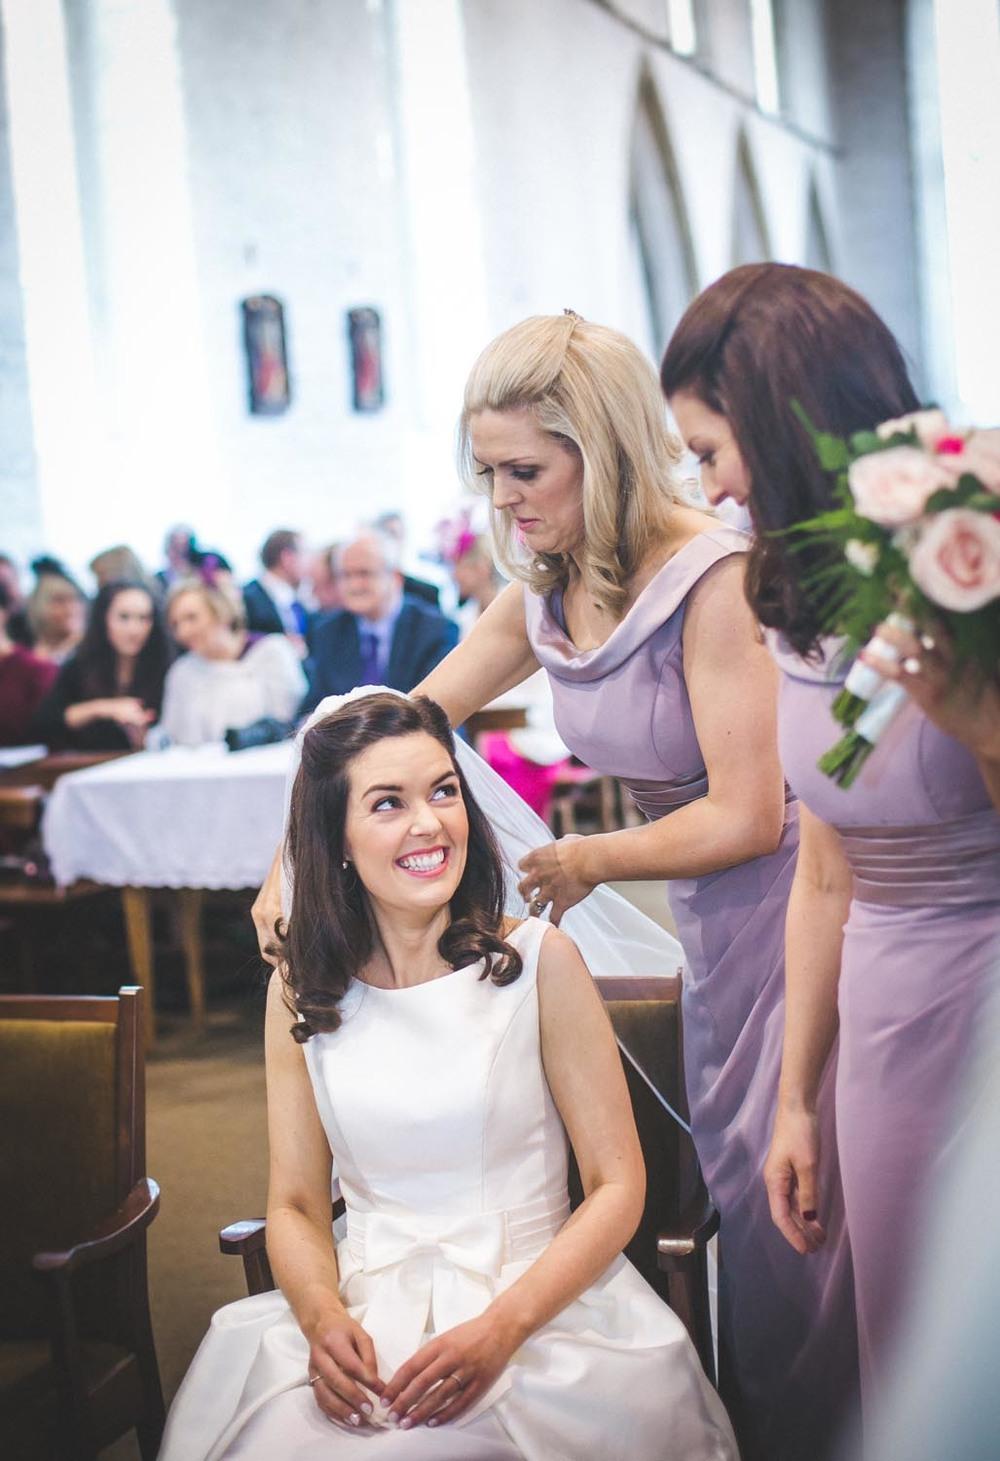 Step House wedding photographer Carlow Borris057.jpg